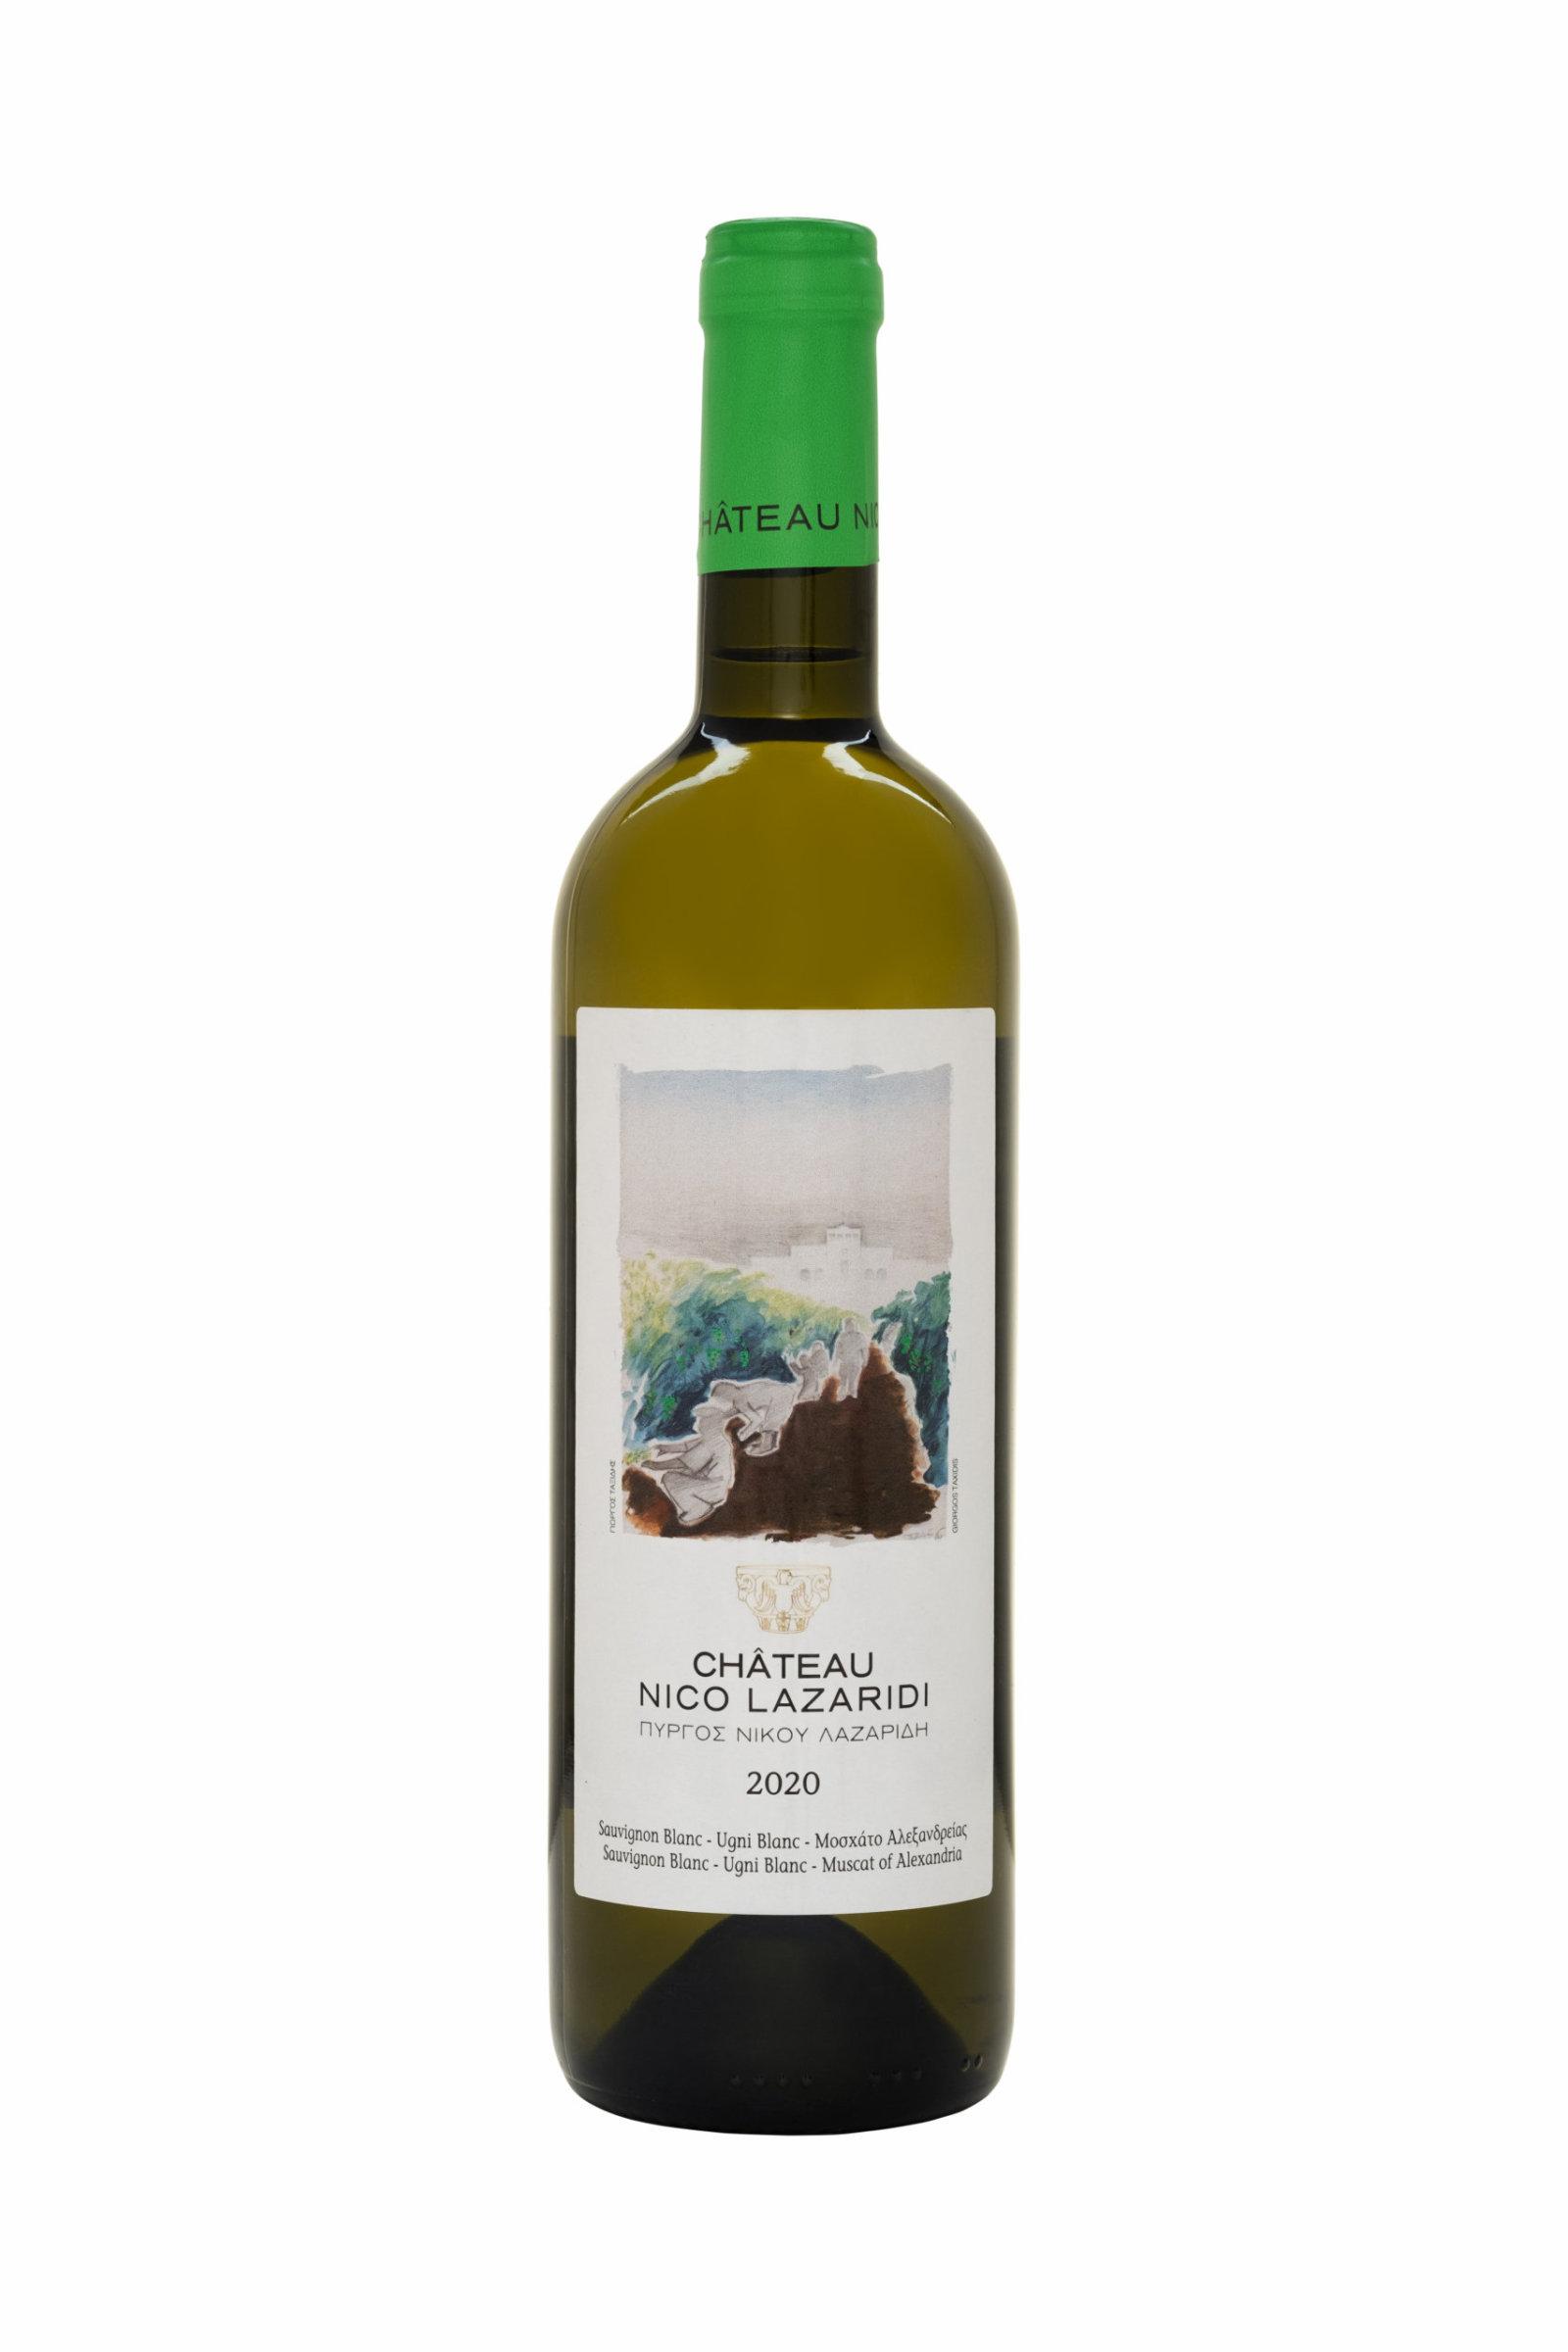 A bottle of Château Nico Lazaridi white wine 2020